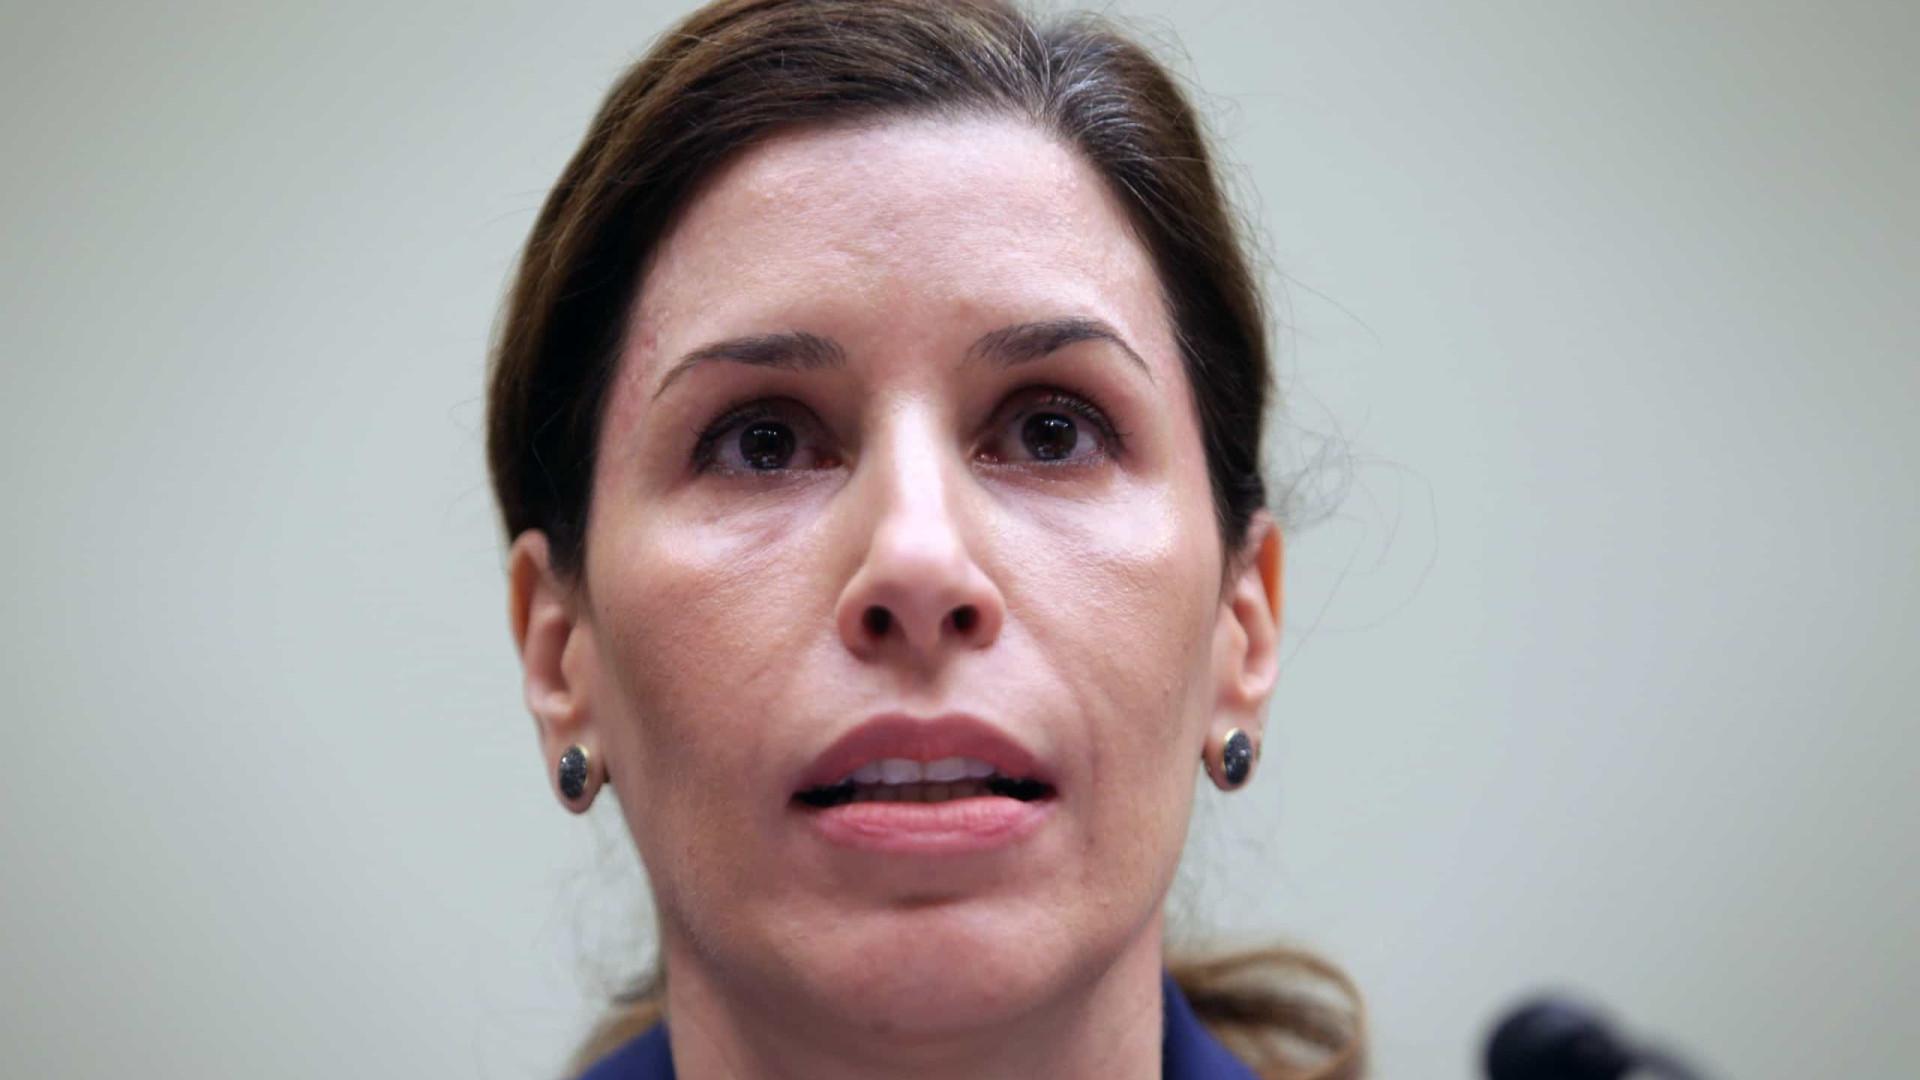 Quem é Luciana Borio, a brasileira que integra comitê anti-Covid-19 de Biden